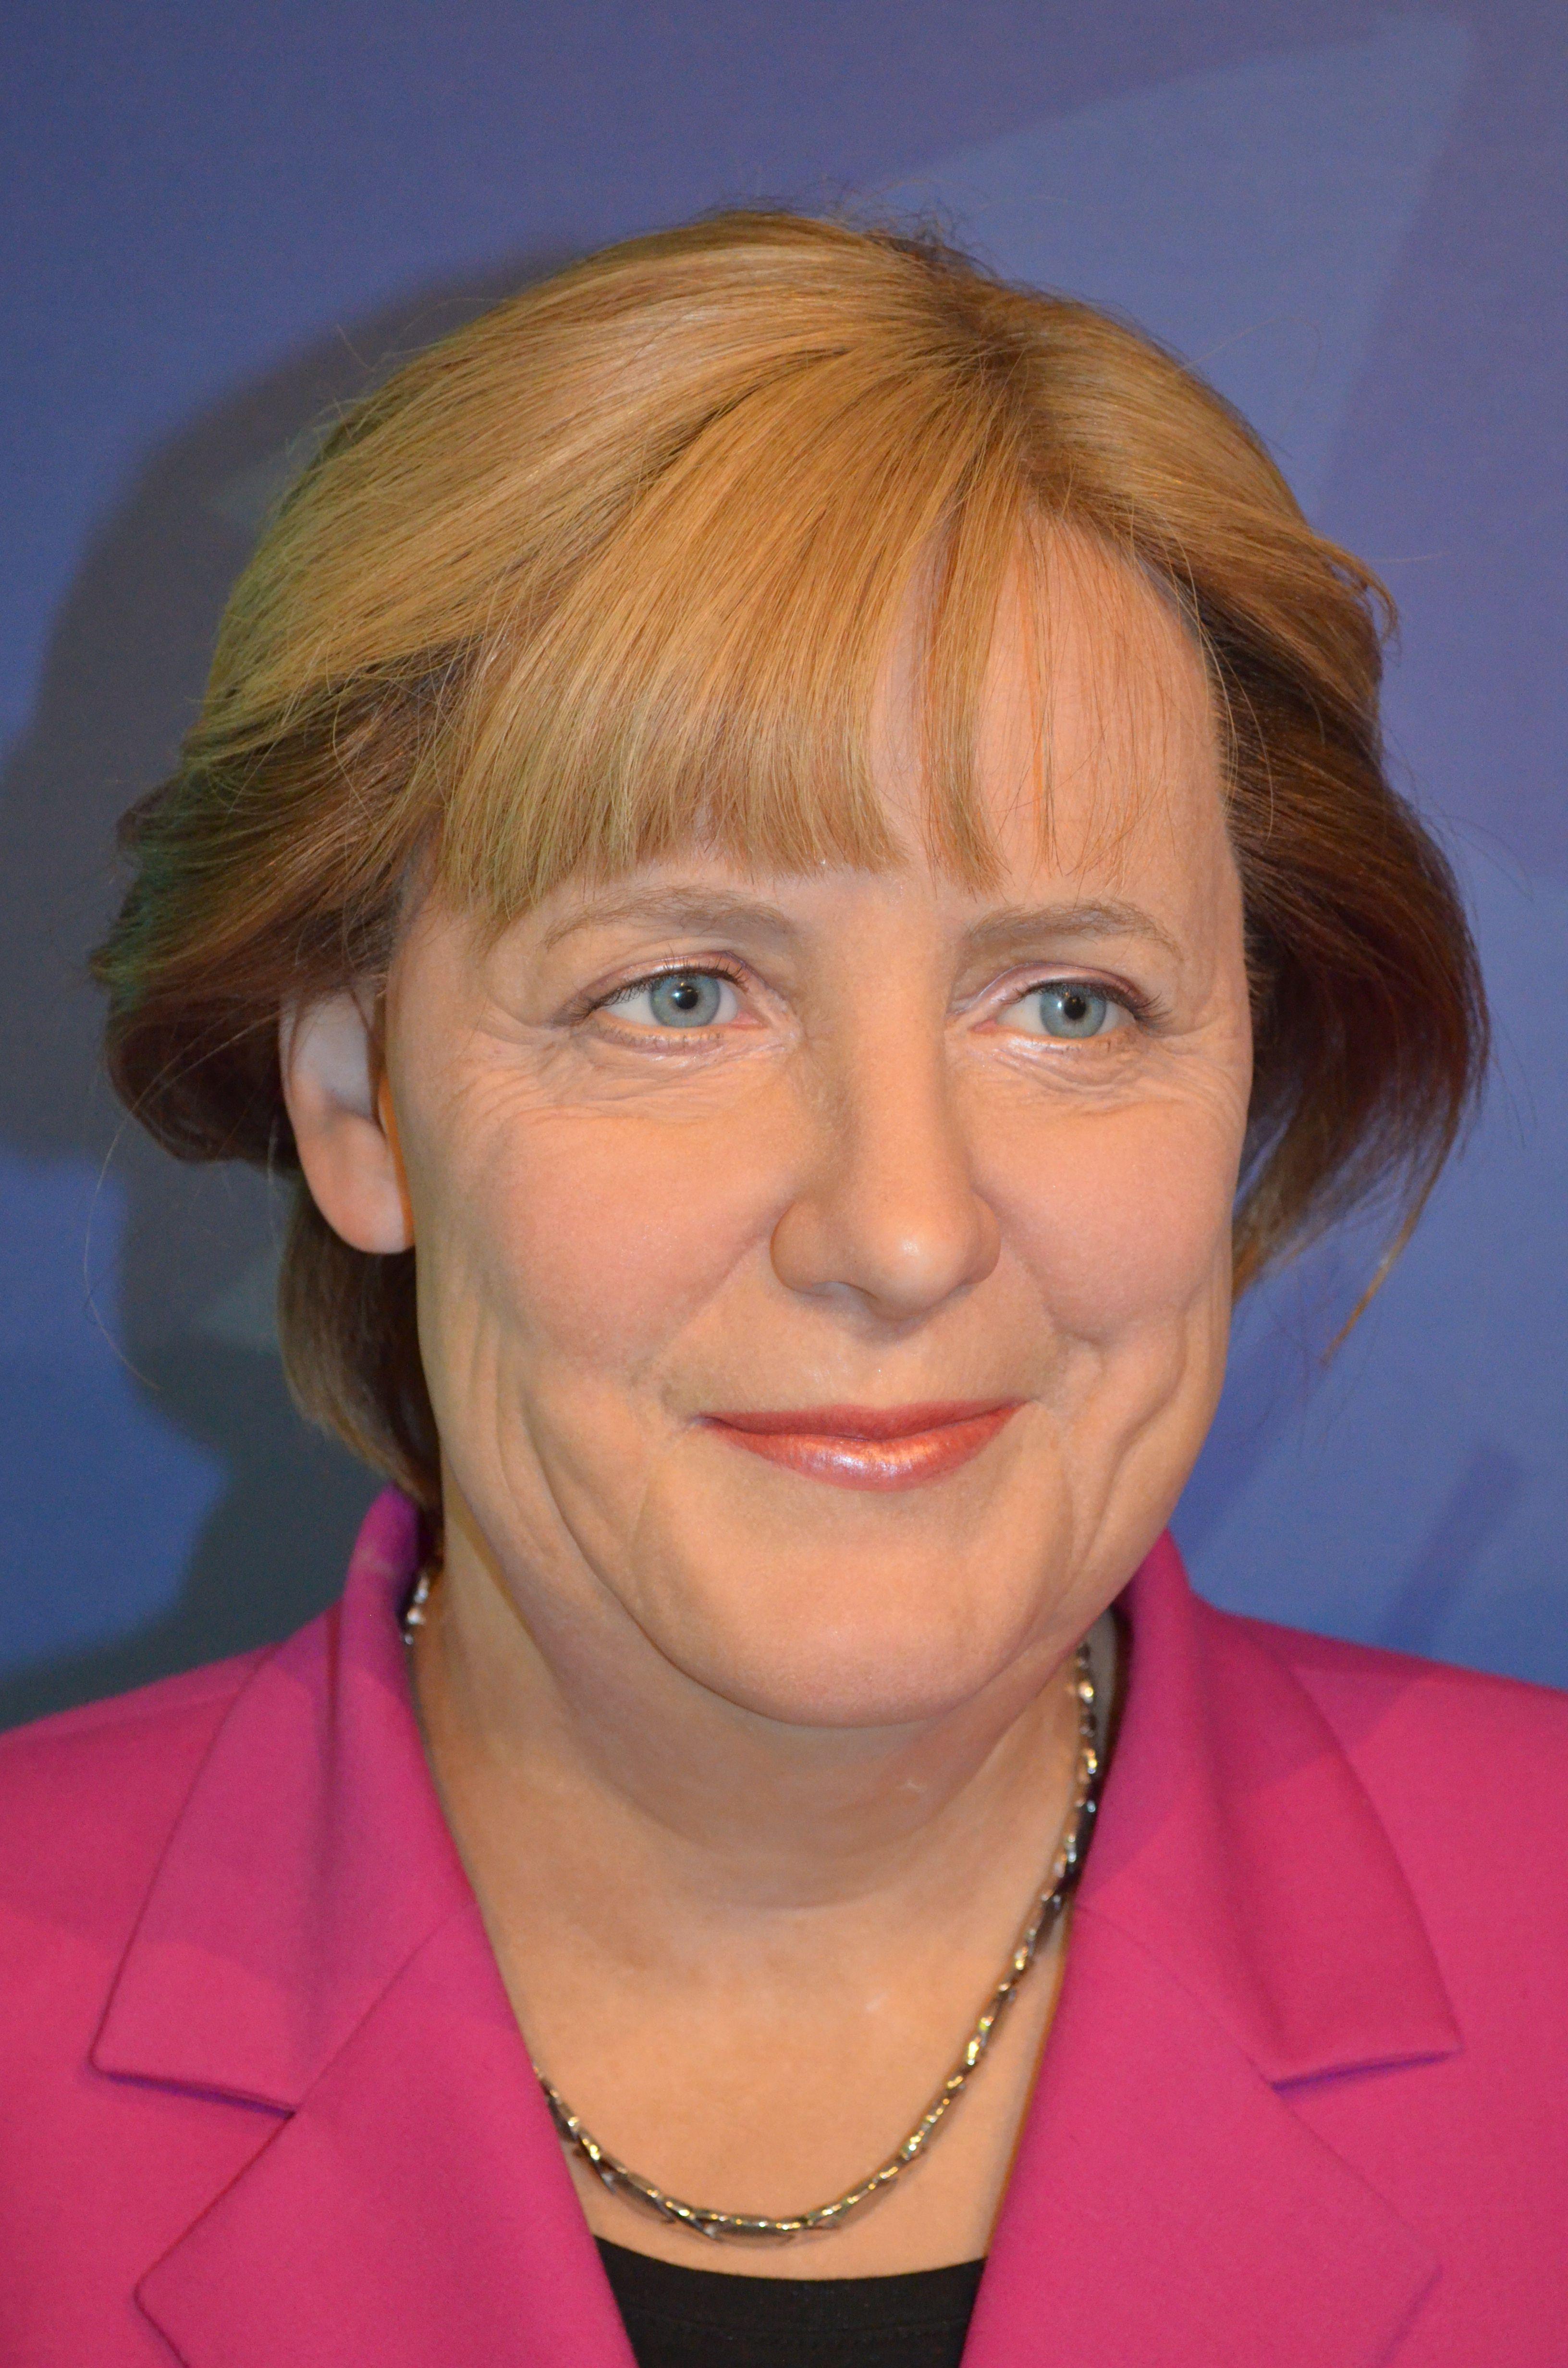 Angela Merkel Topless angela merkel   madame tussauds, angela merkel, face